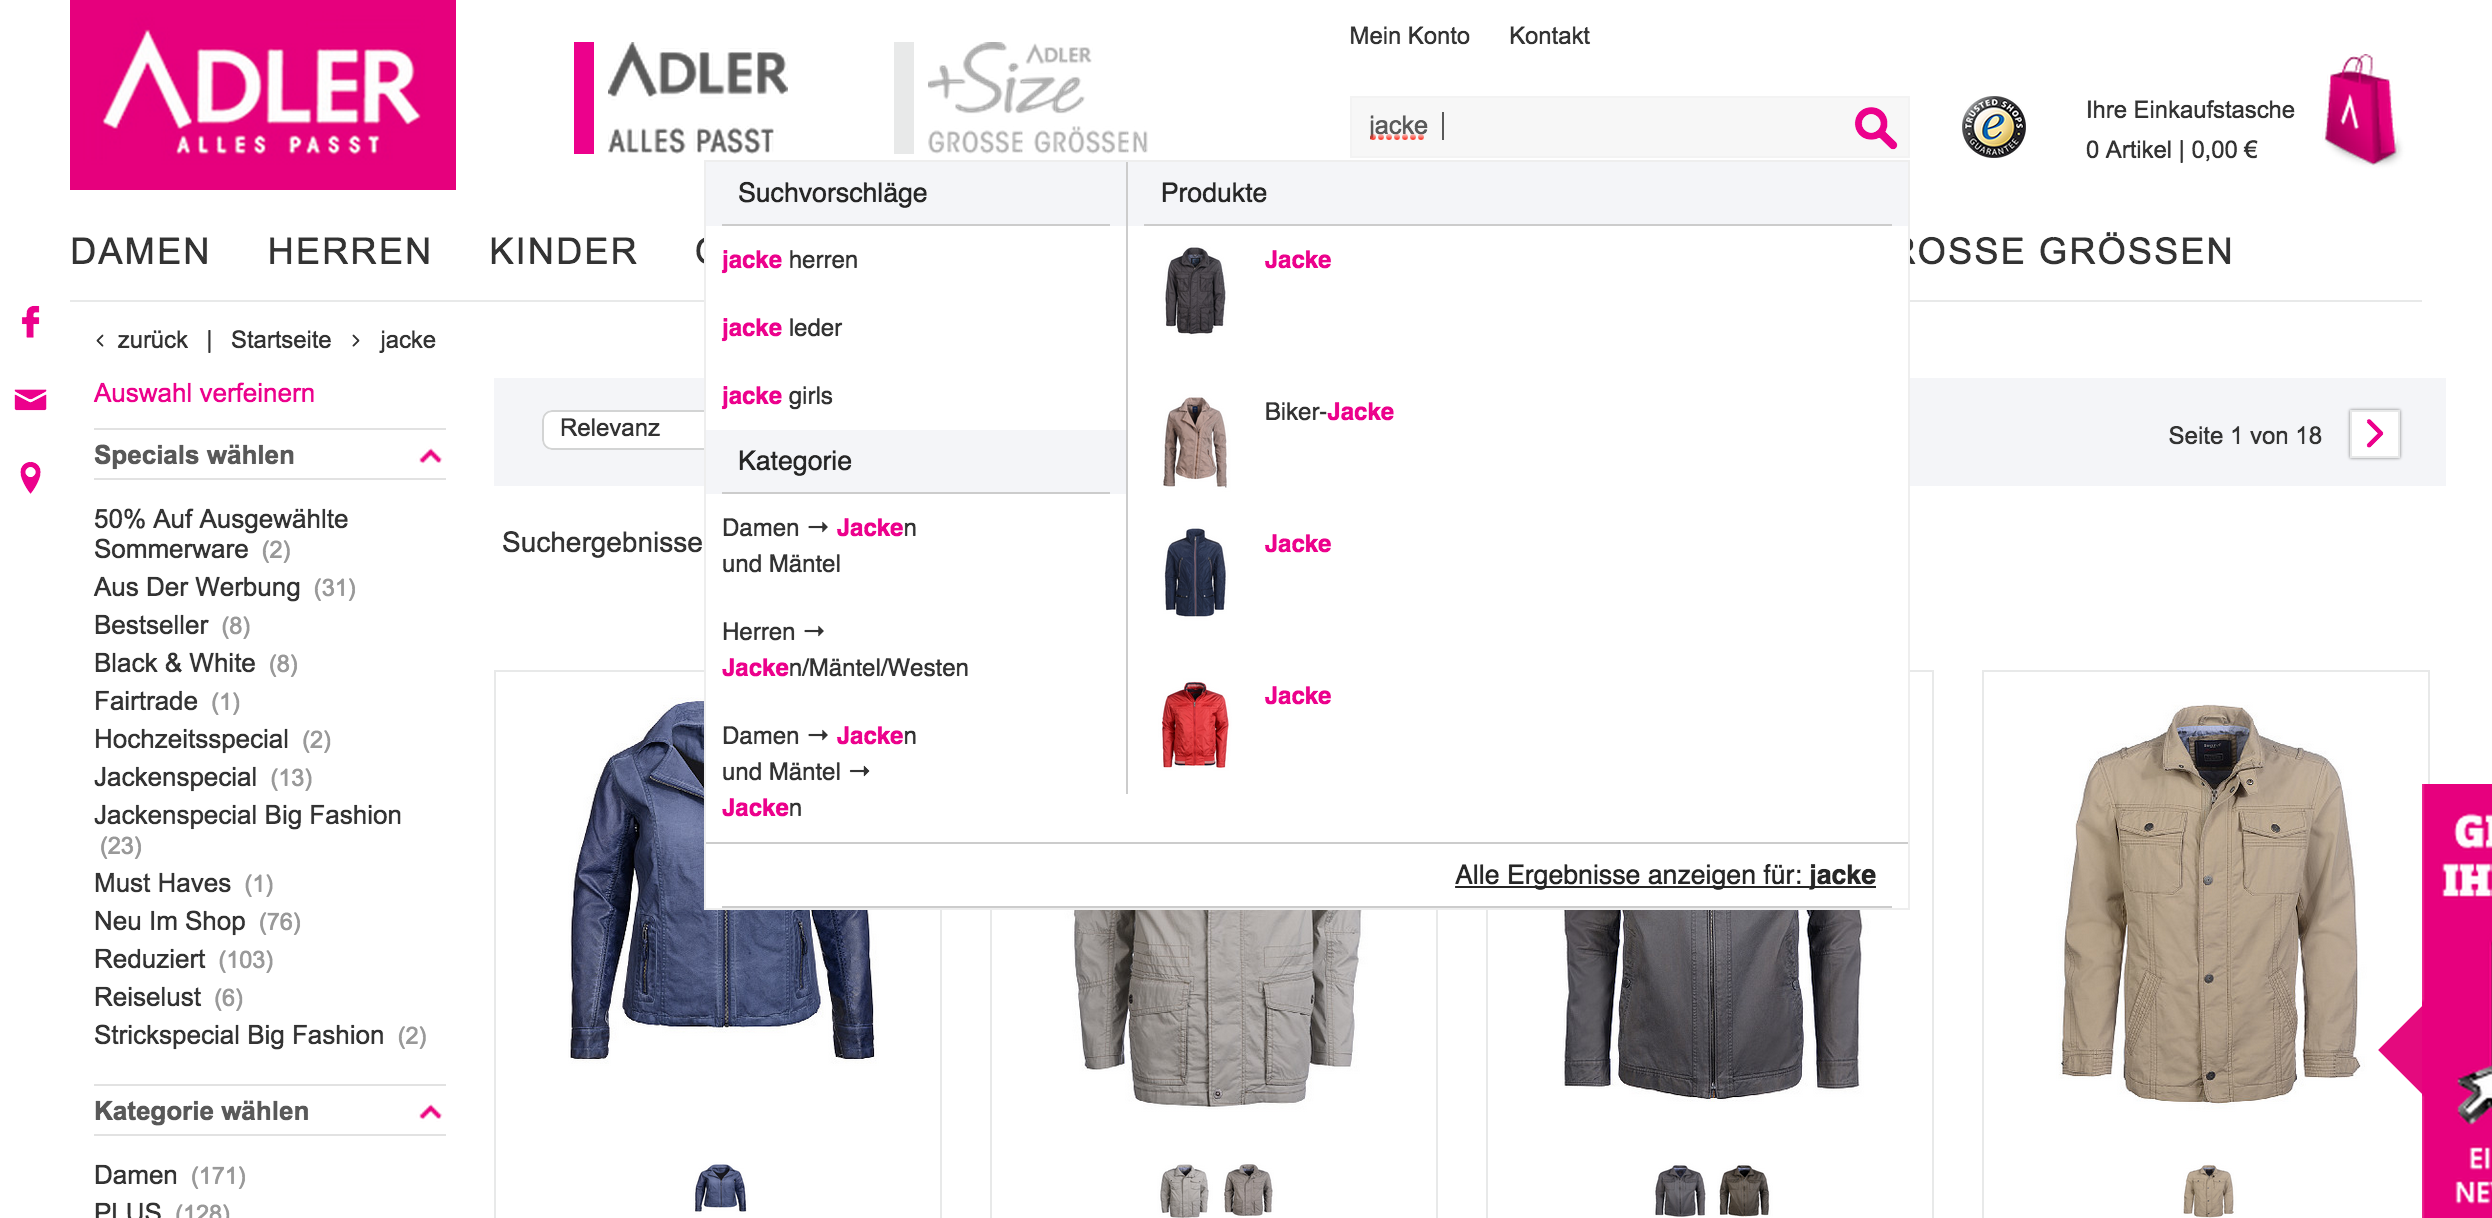 Online-Shop www.adlermode.com